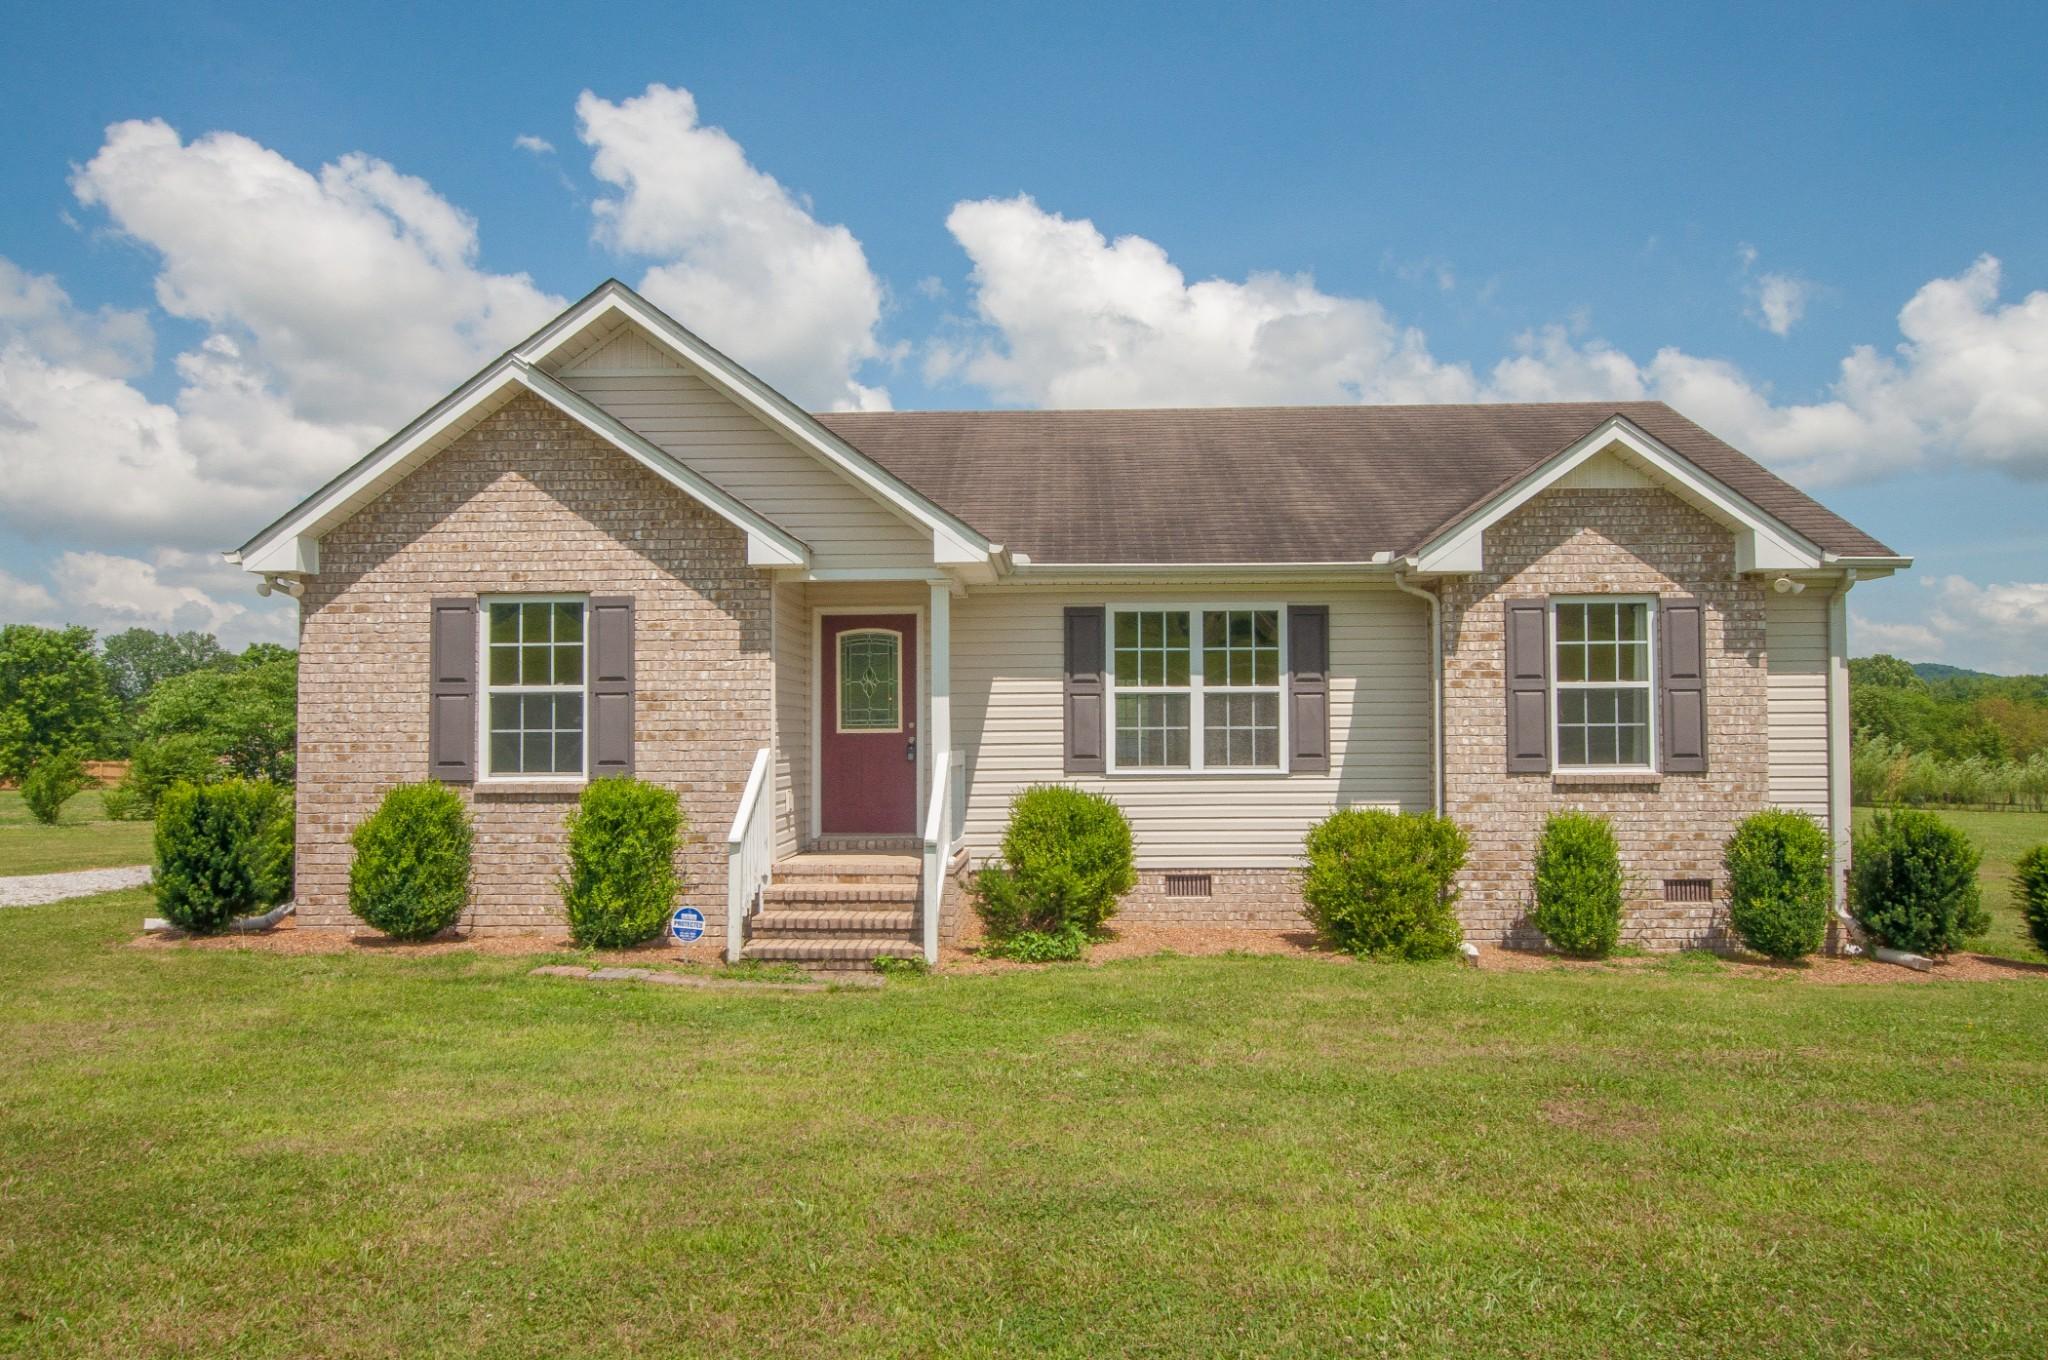 4235 HIGHWAY 10 Property Photo - Hartsville, TN real estate listing